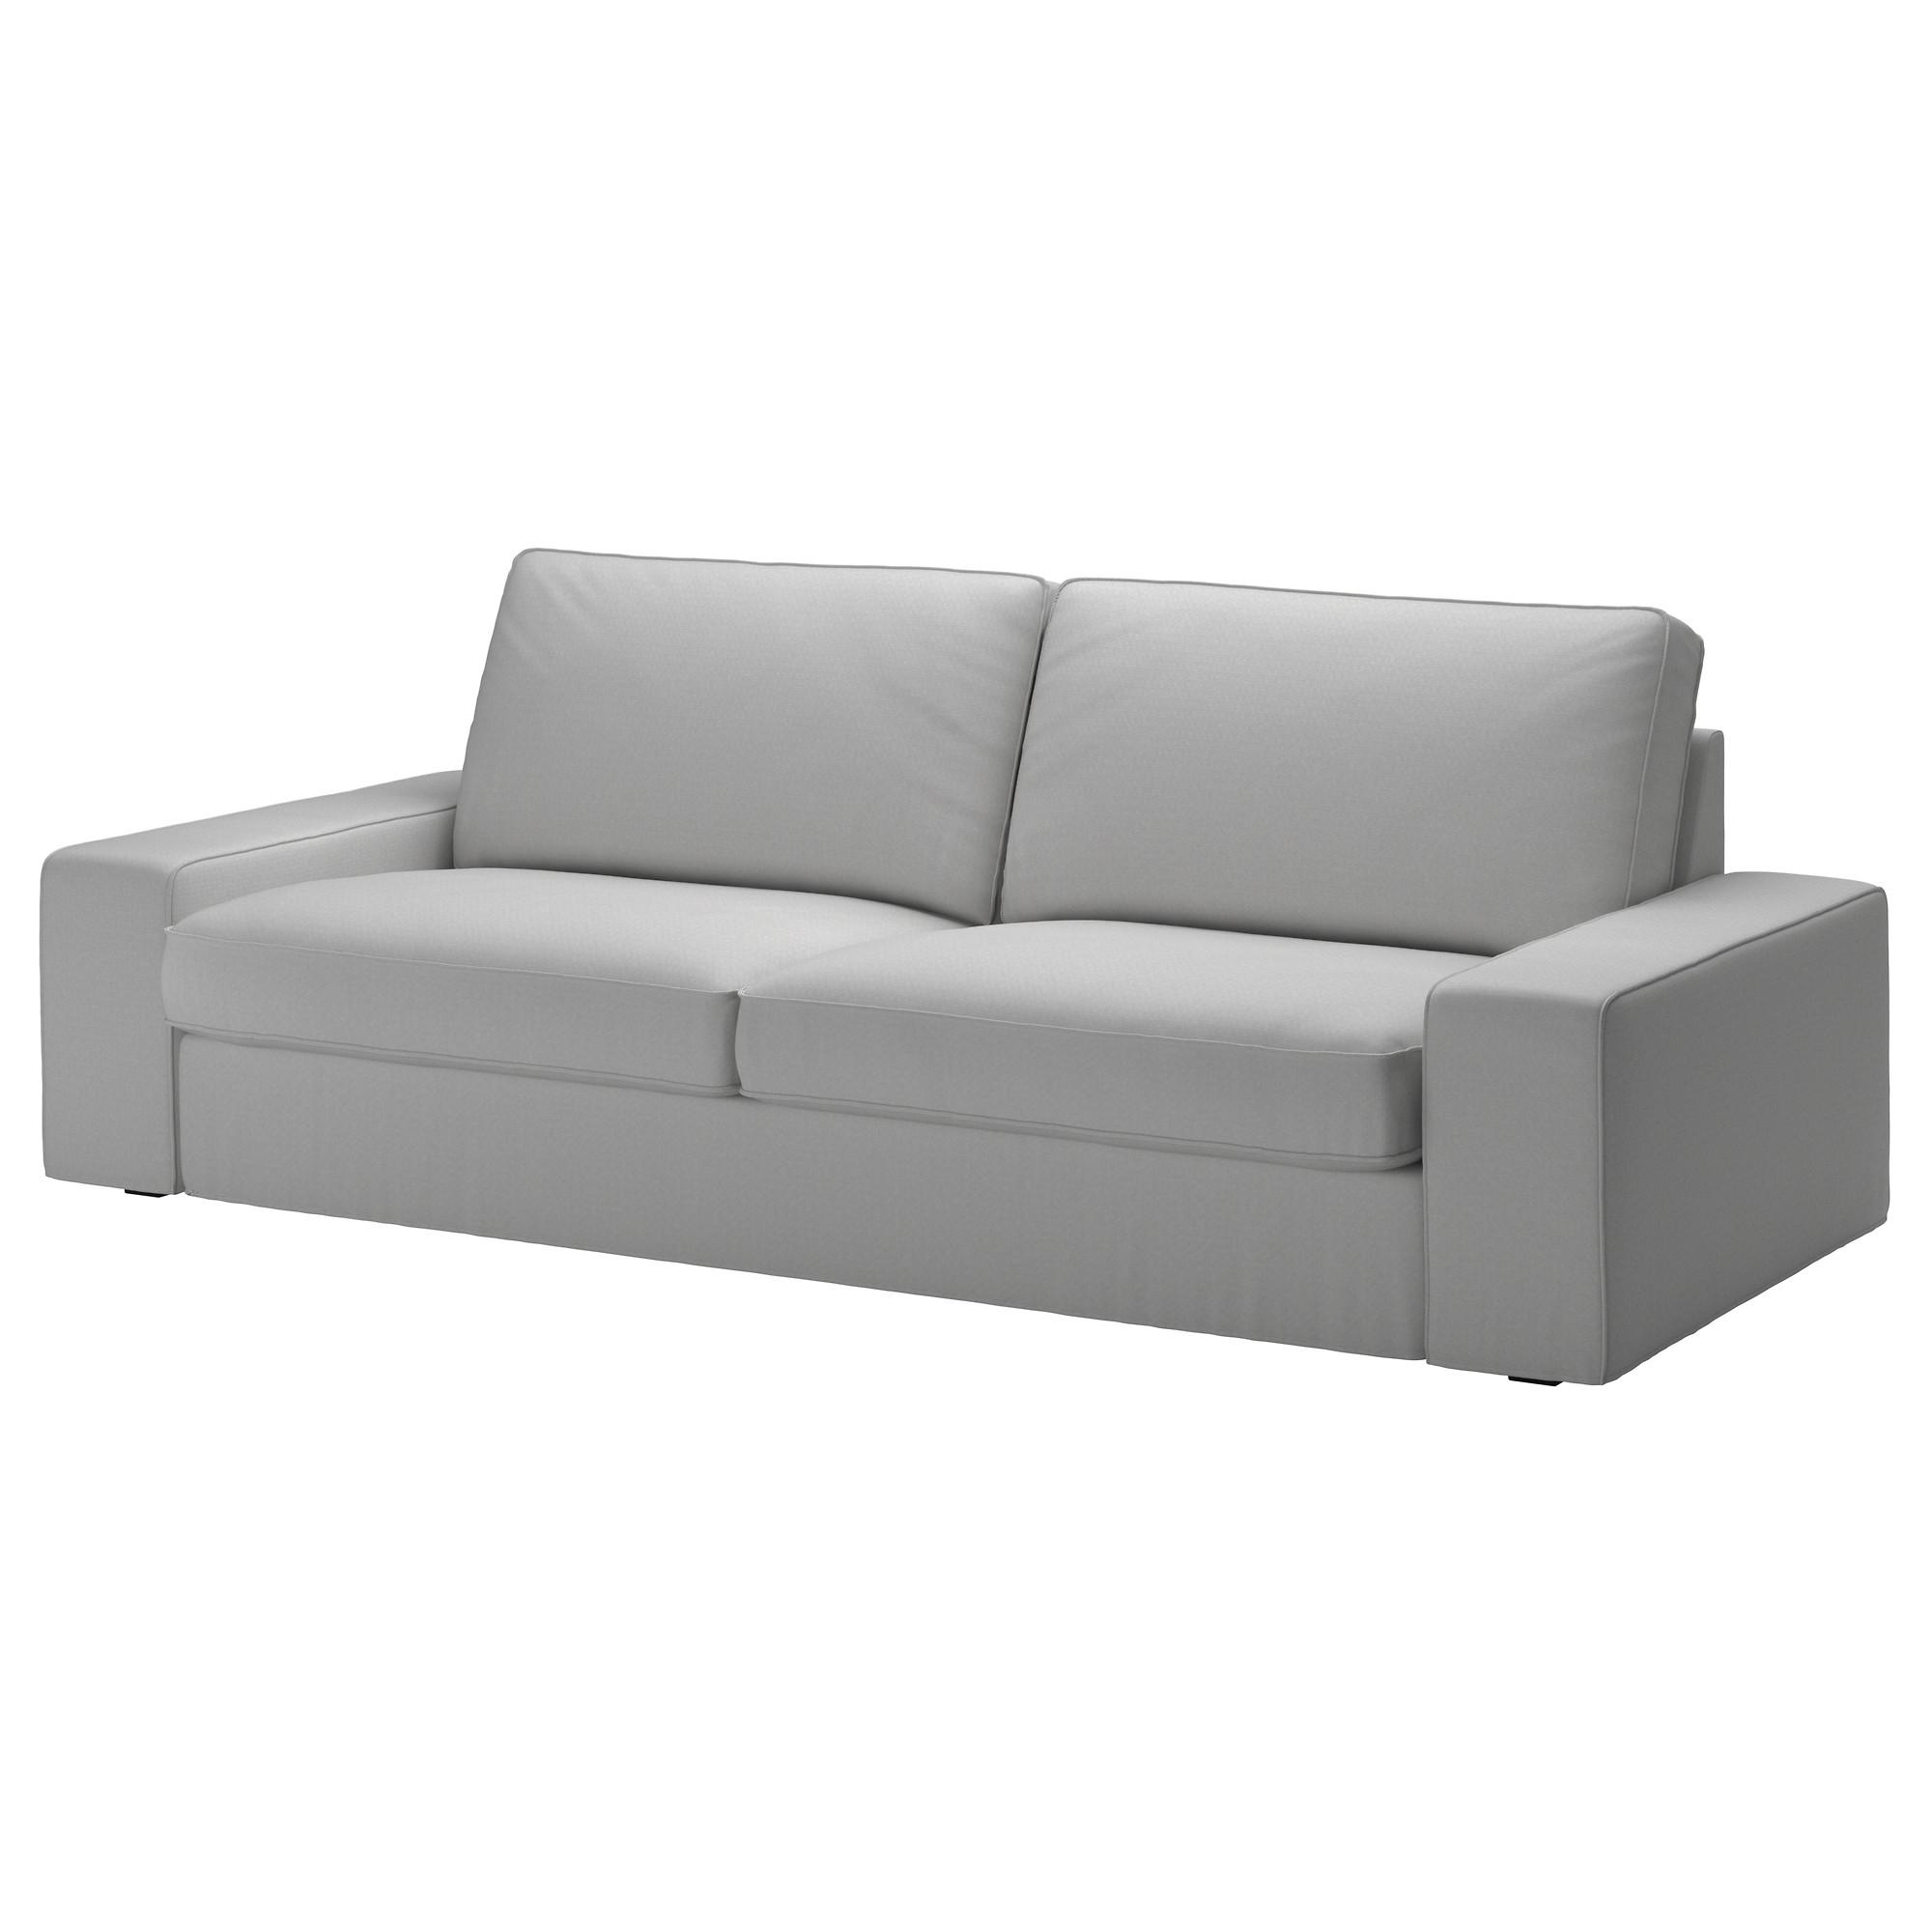 Kivik Sofa Cover – Orrsta Light Gray – Ikea Pertaining To Sofa With Washable Covers (Image 5 of 20)